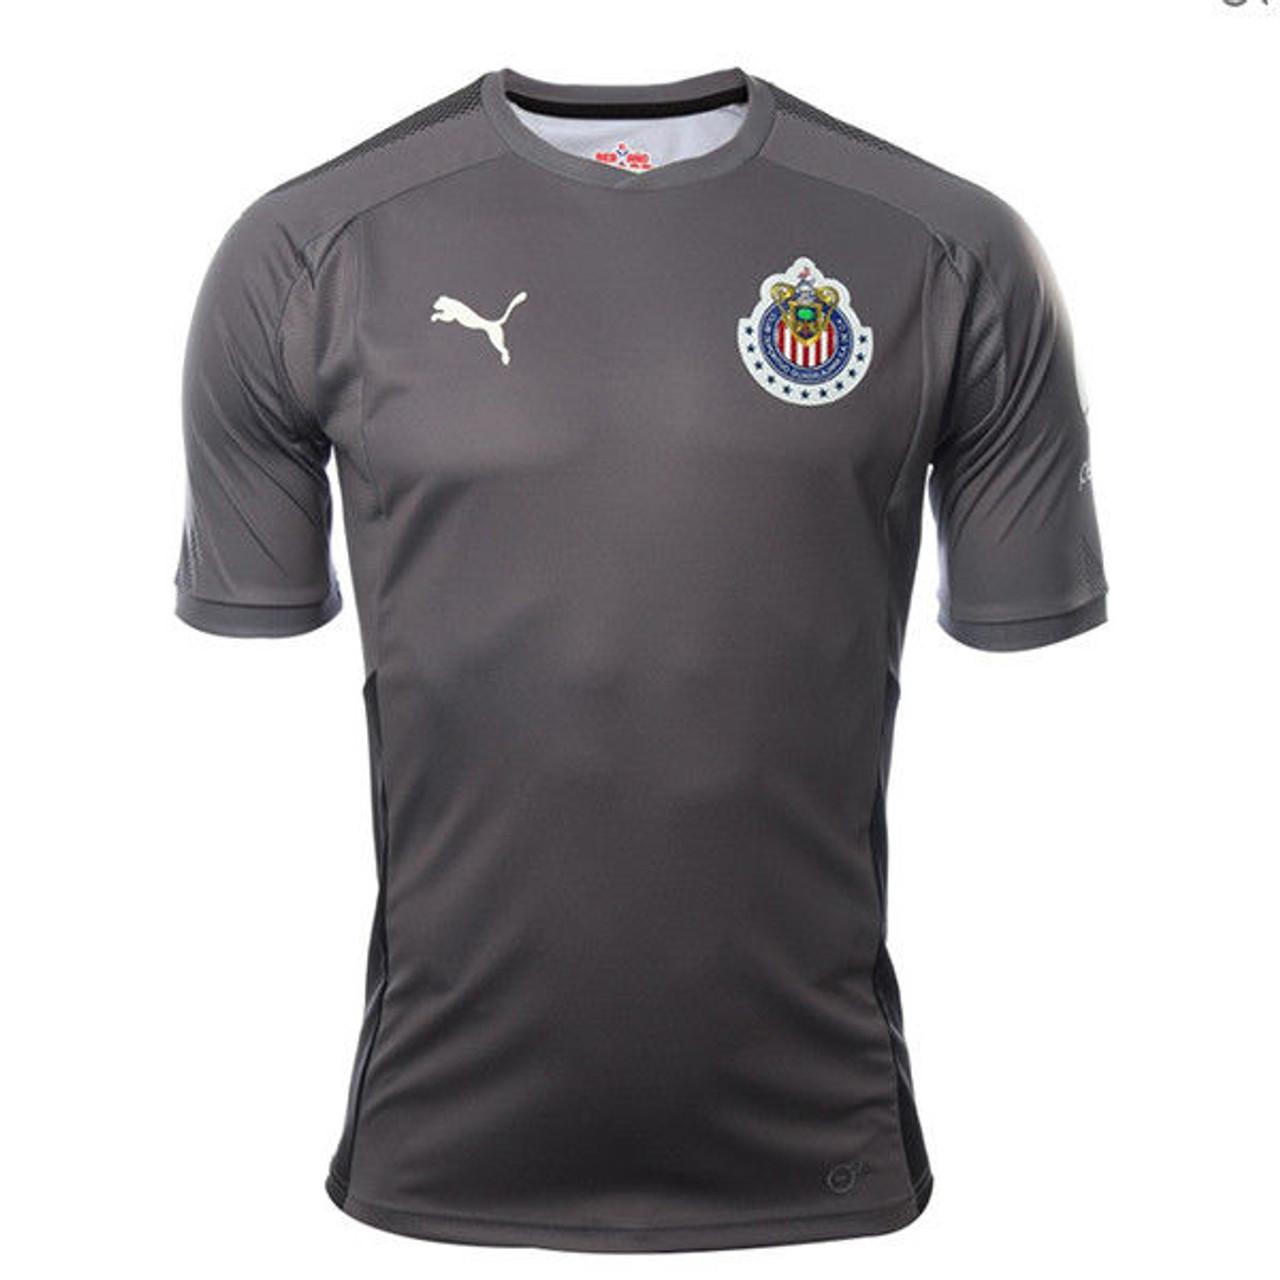 784471e97 PUMA CHIVAS 2018 G K JERSEY GREY - Soccer Plus